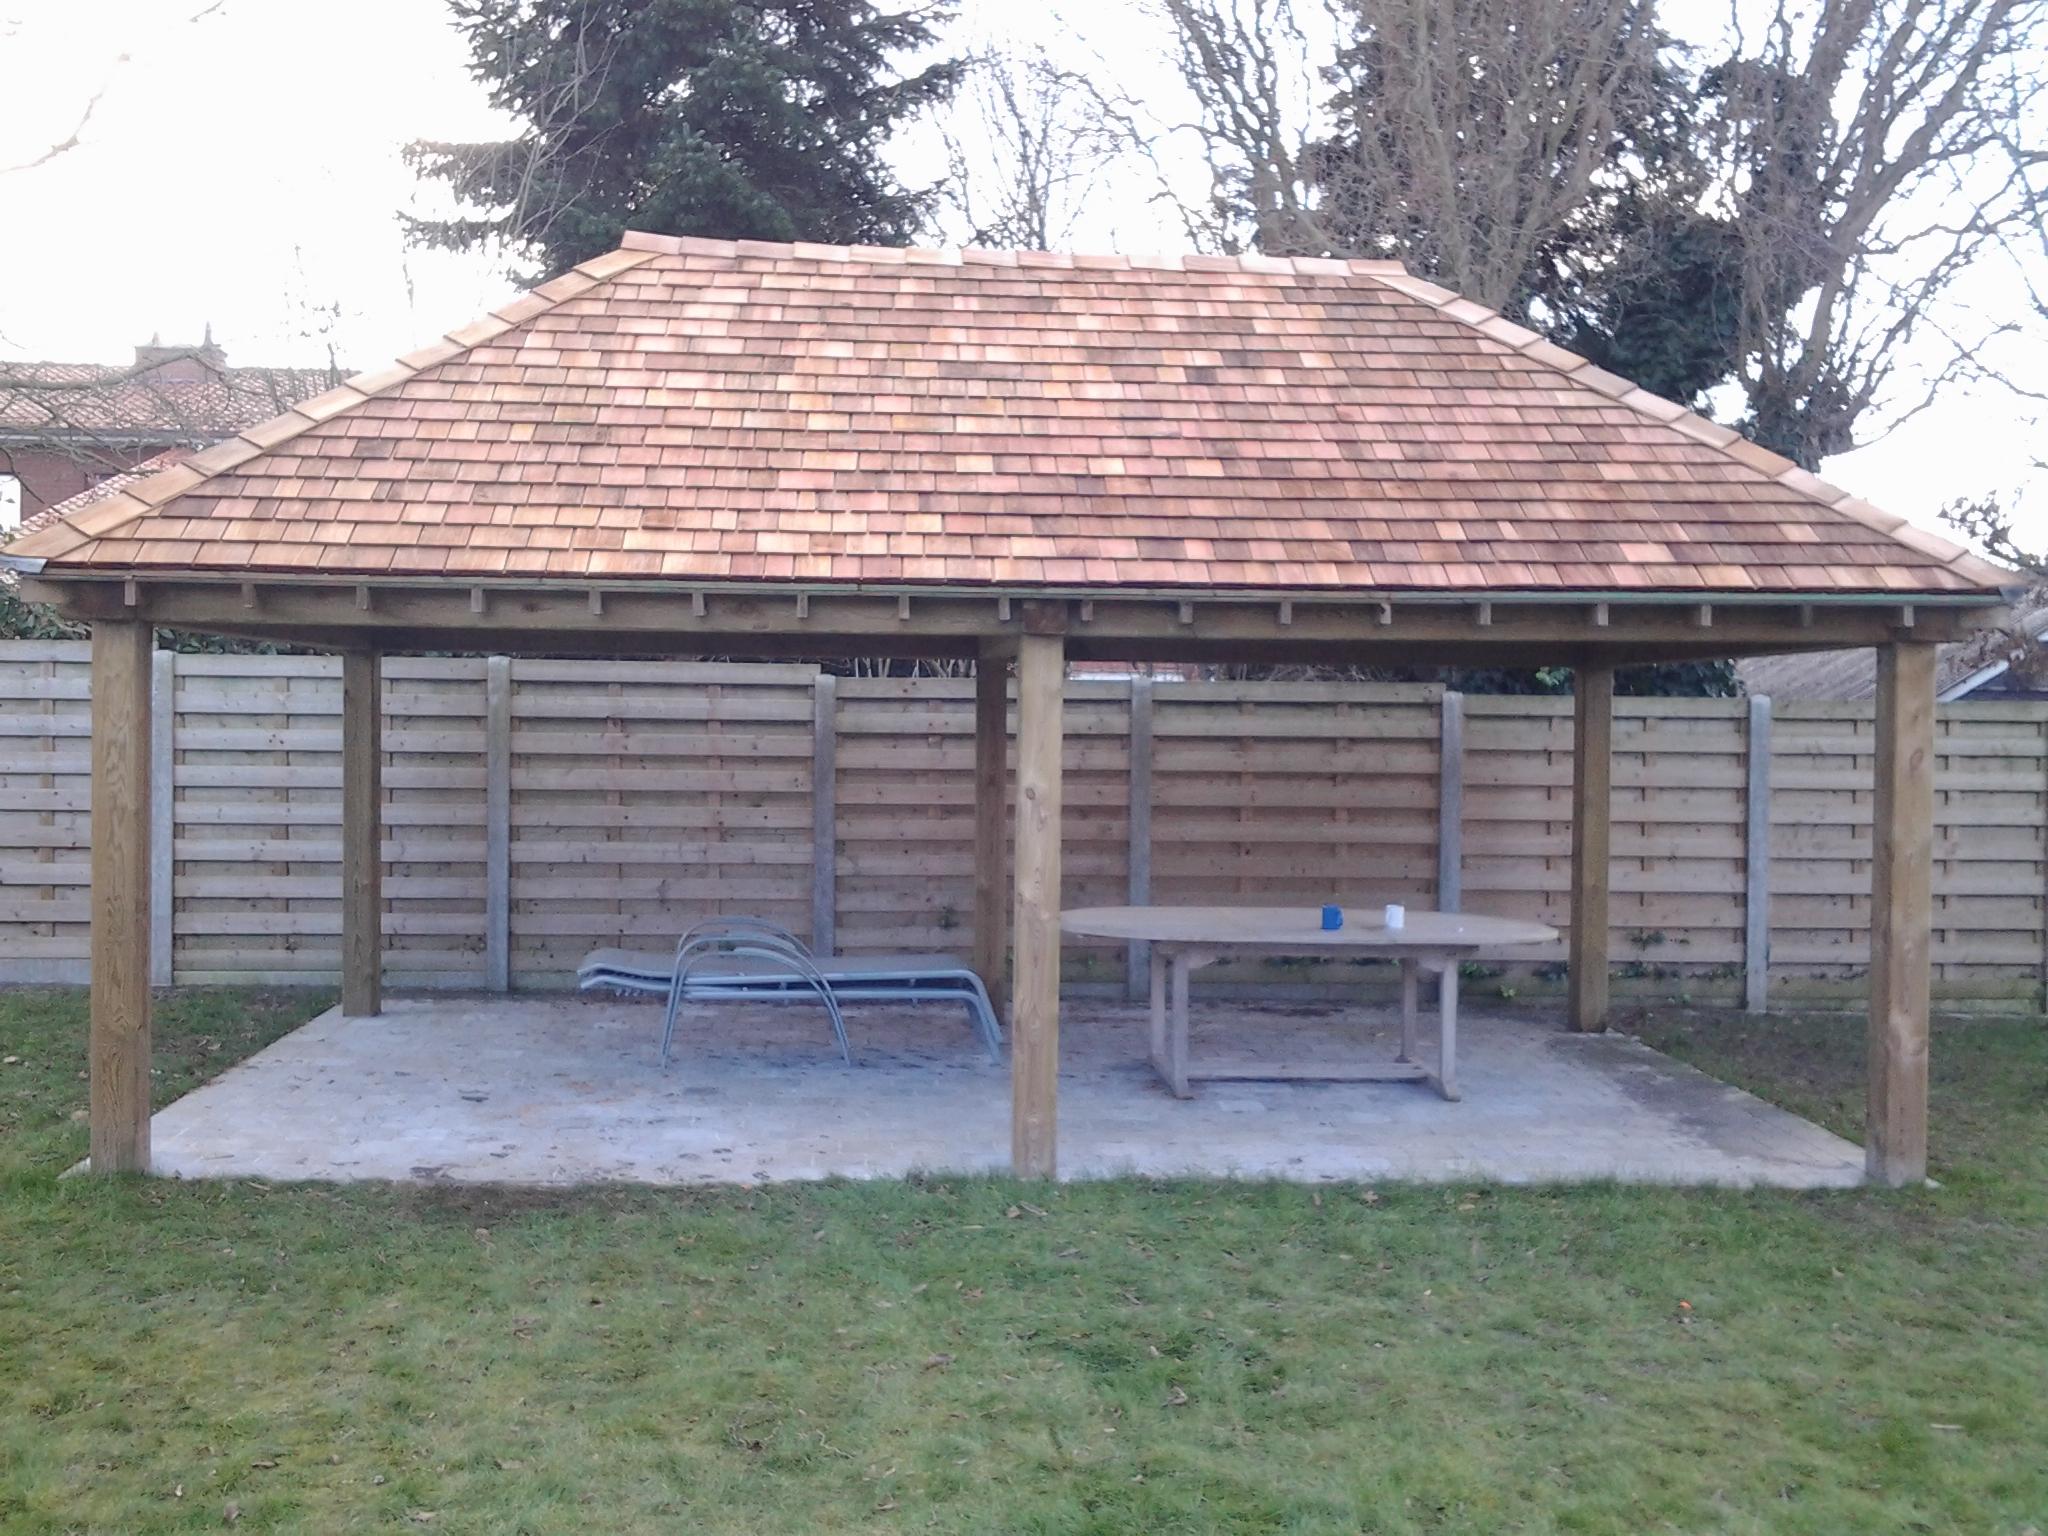 Overdekte terrassen tuinhuis carport terras afsluitingen - Overdekt terras tegel ...